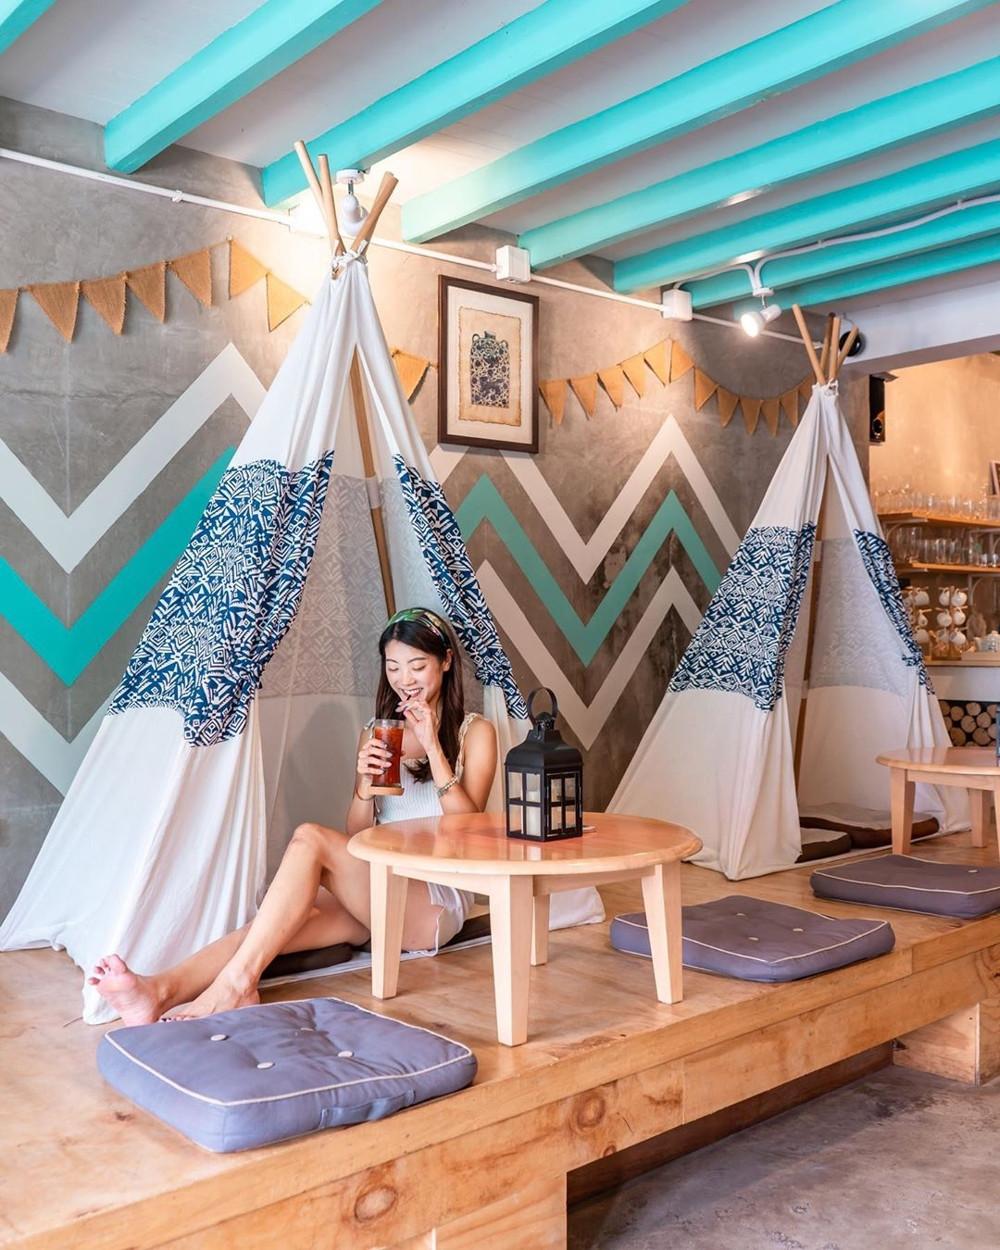 Phuket cafes - The Tent